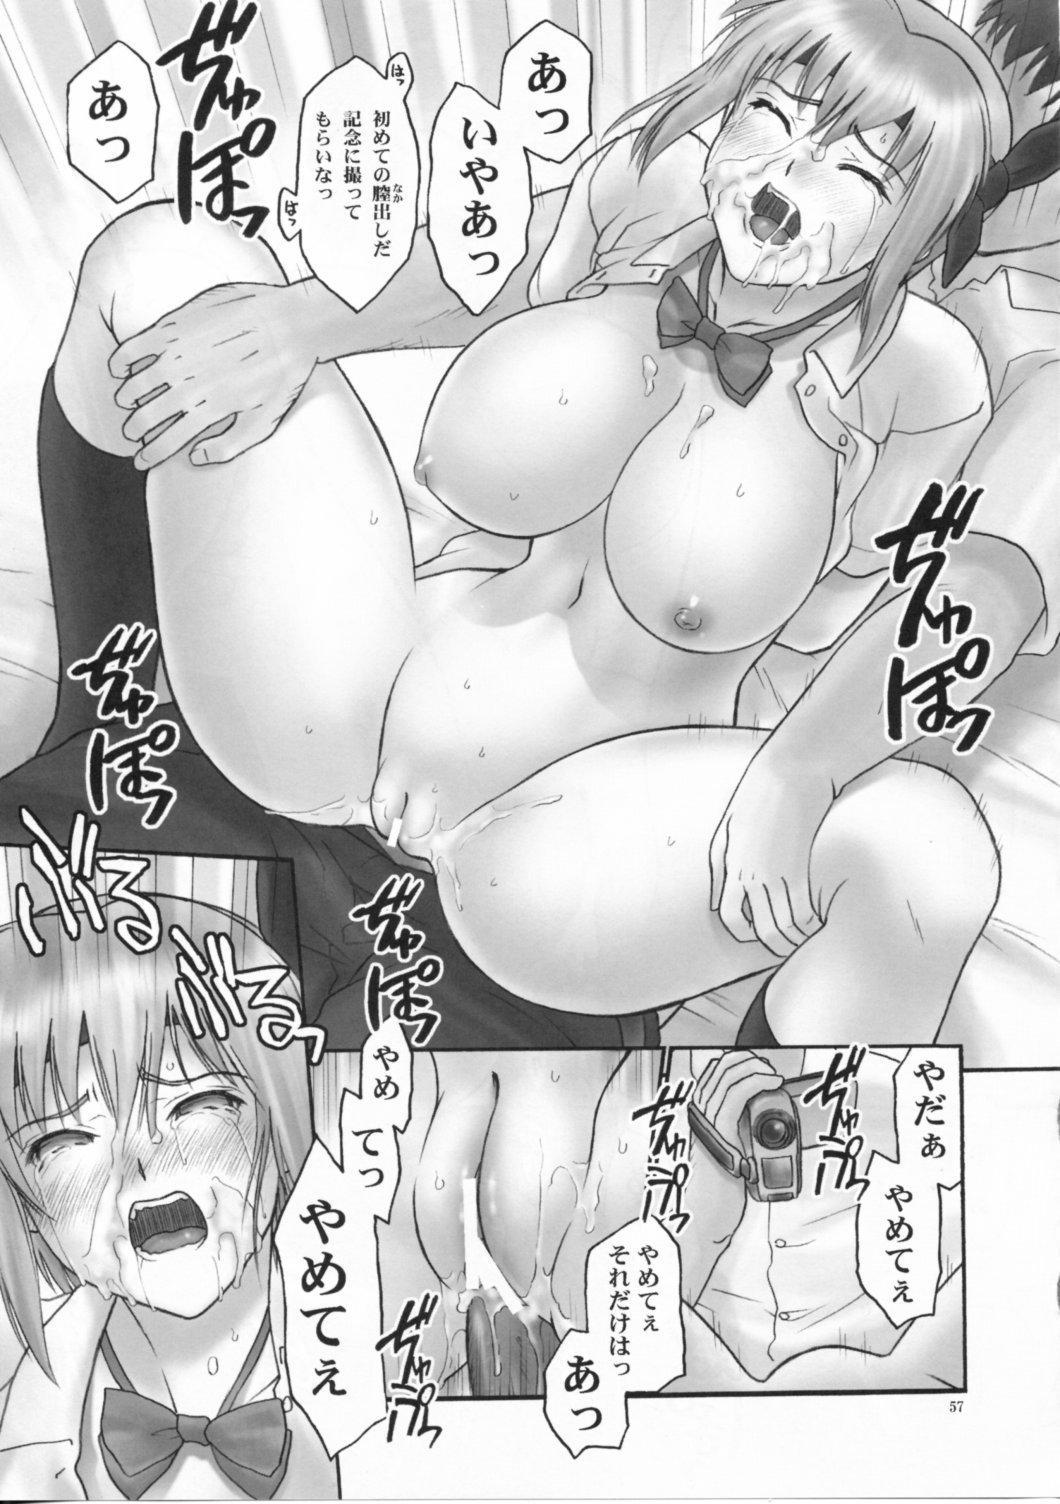 (C72) [Hellabunna (Iruma Kamiri)] REI - slave to the grind - CHAPTER 04: SURGE (Dead or Alive) 55